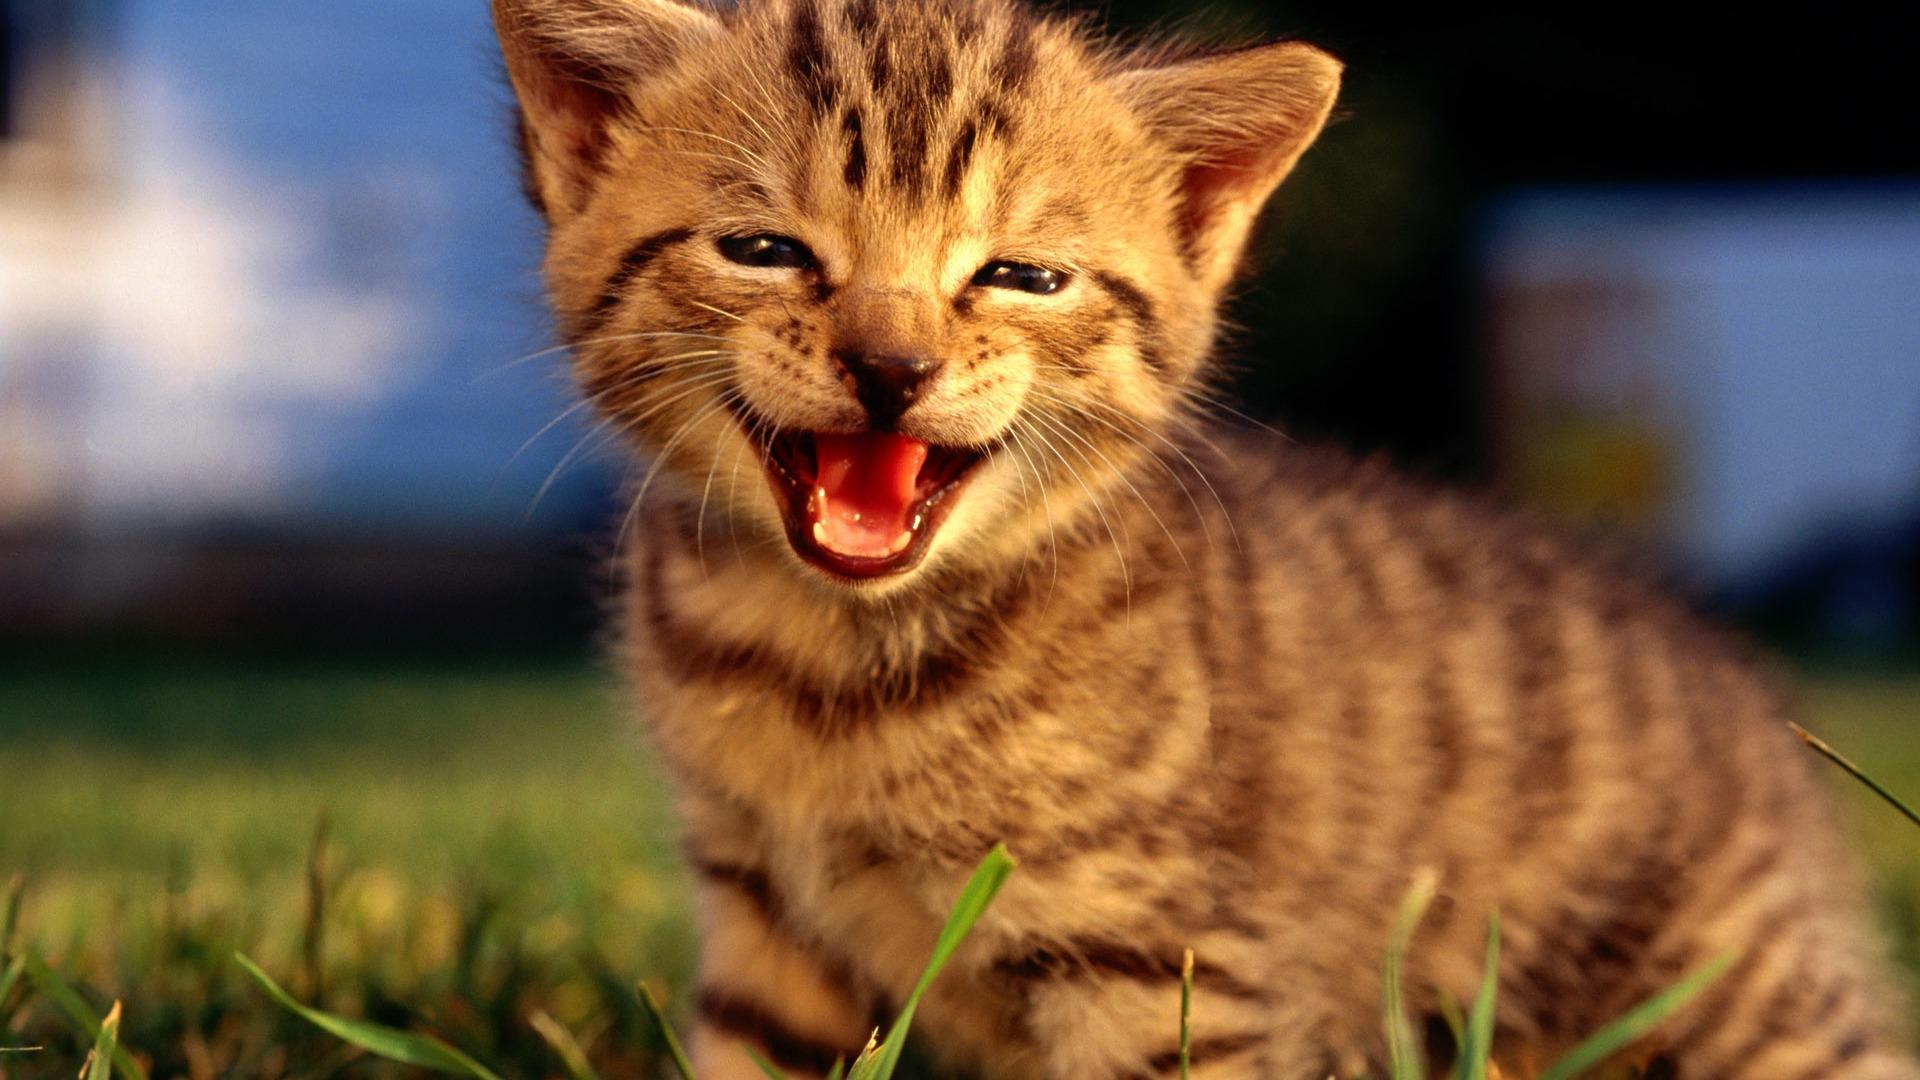 HD wallpaper cute cat photo #3 - 1920x1080 Wallpaper ... Hd Wallpaper 1920 X 1080 Kittens